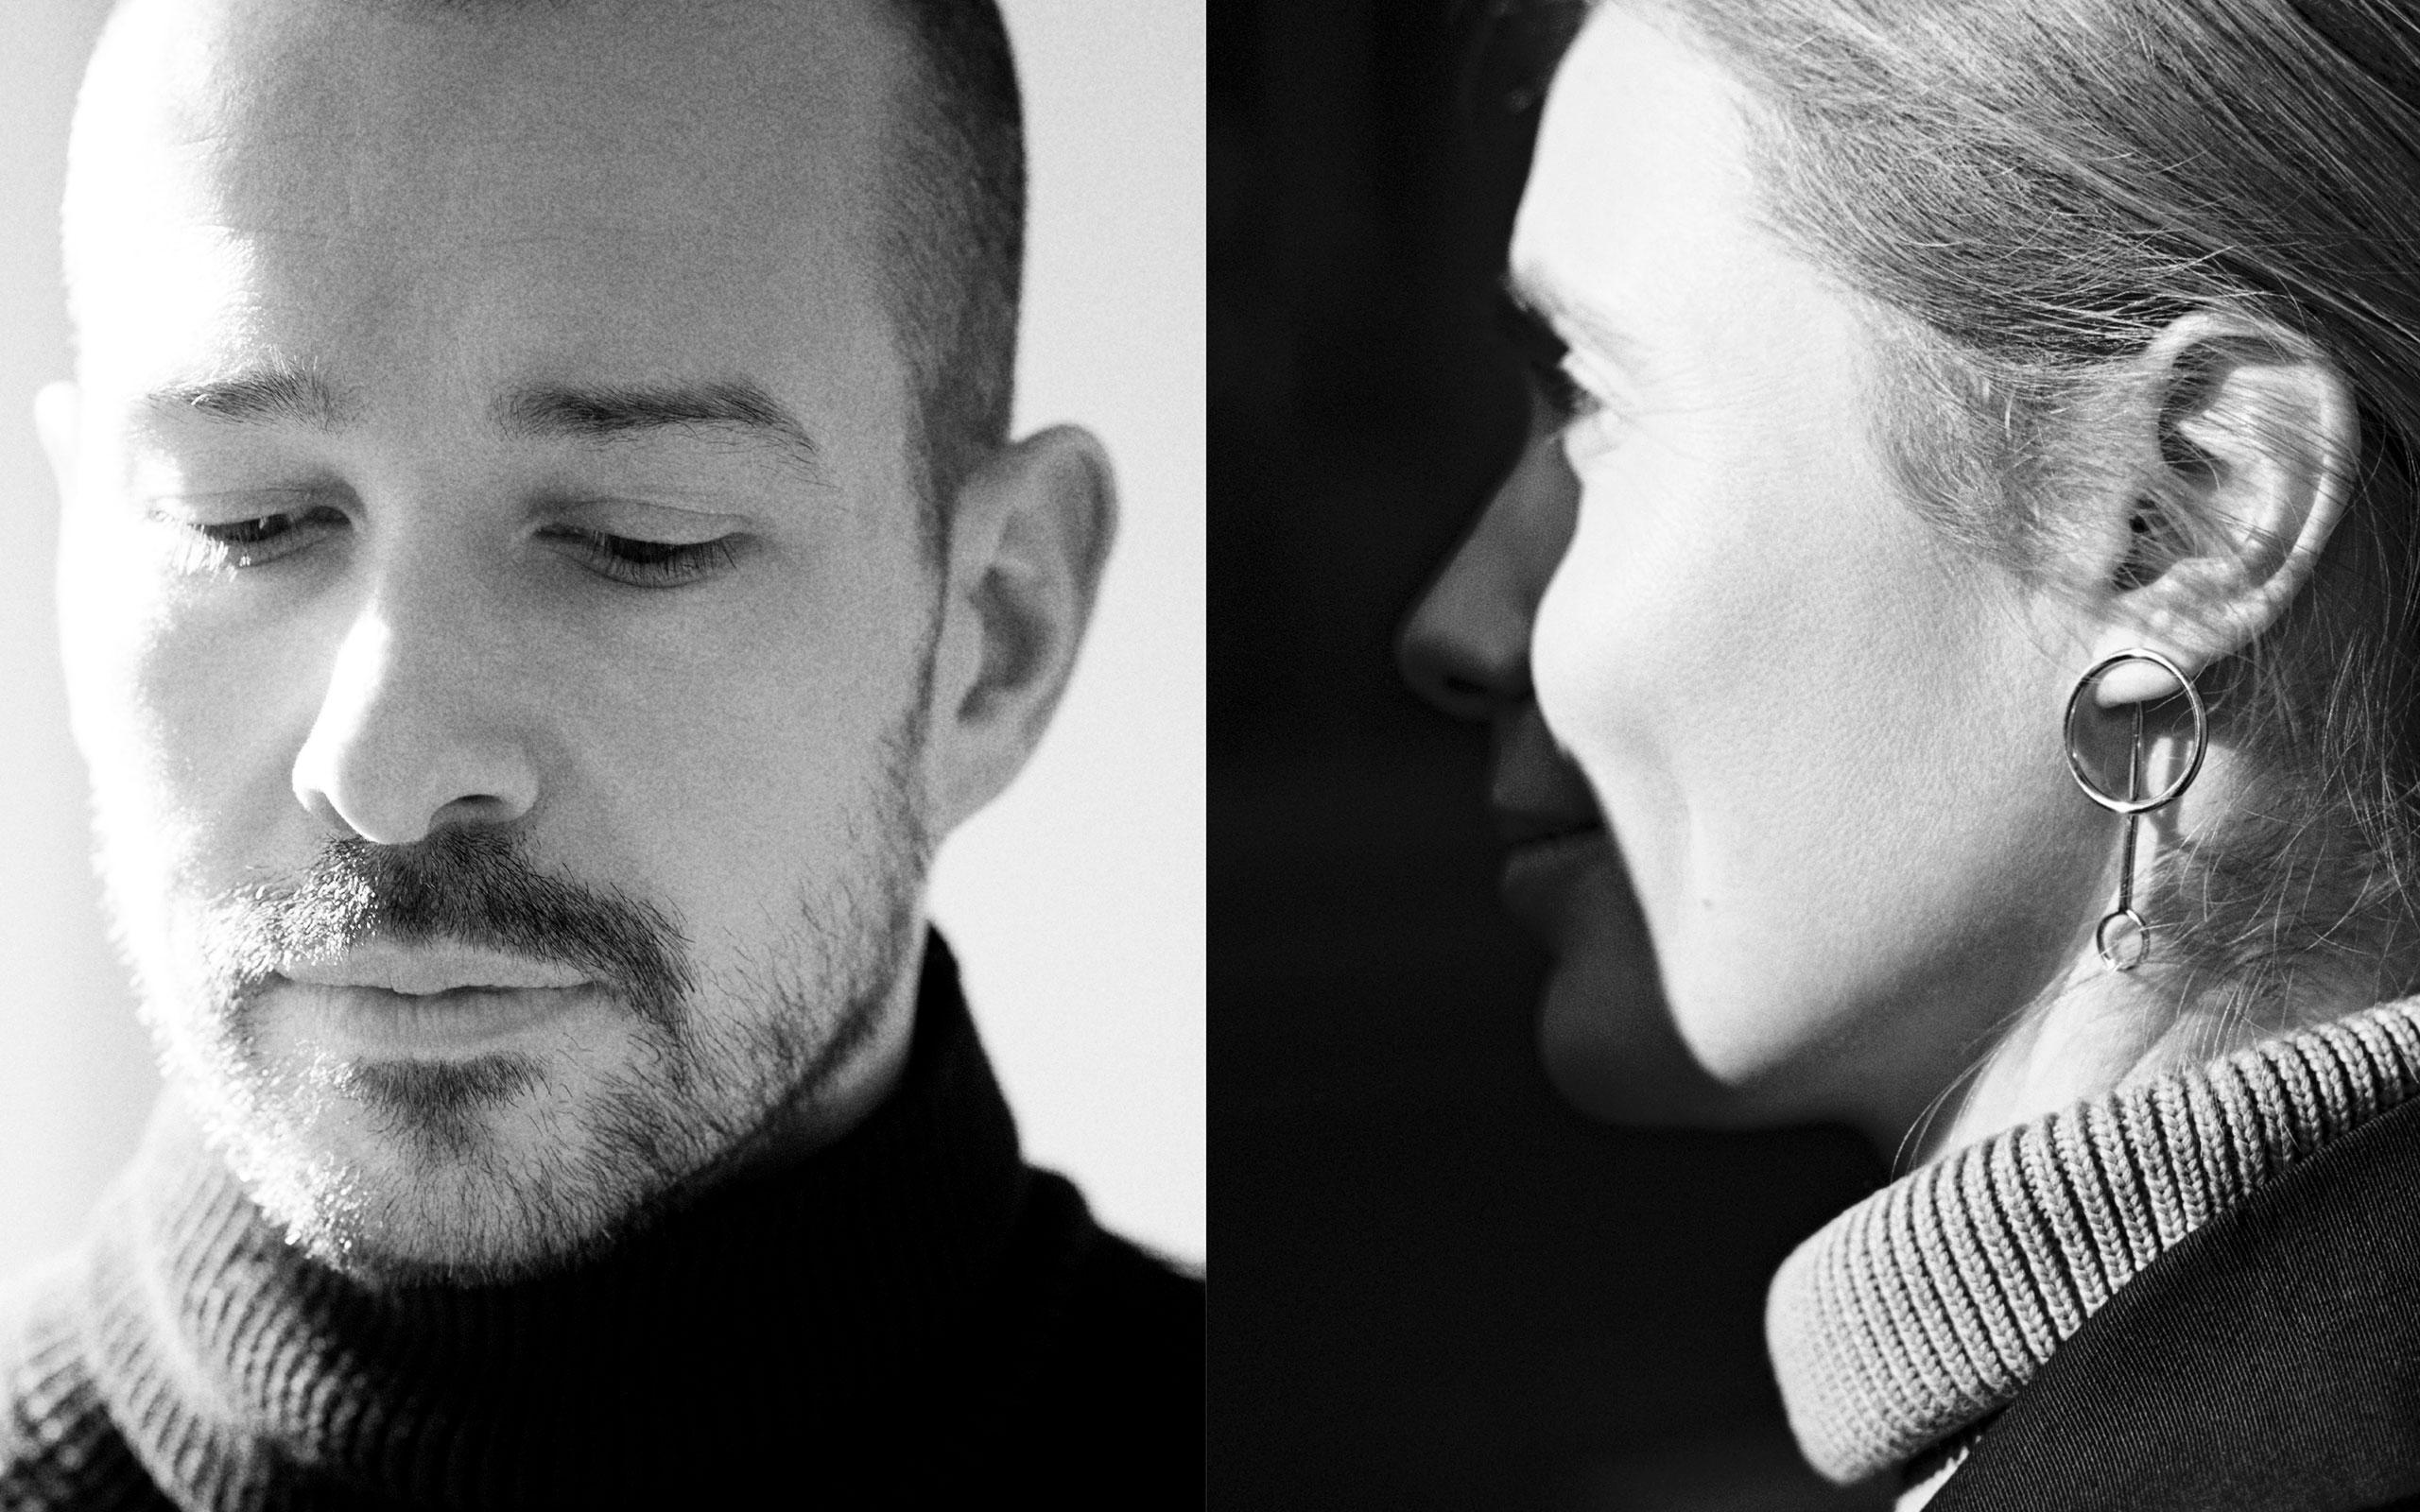 Interview with<br>Lucie Meier &#038; Luke Meier<br>from JIL SANDER